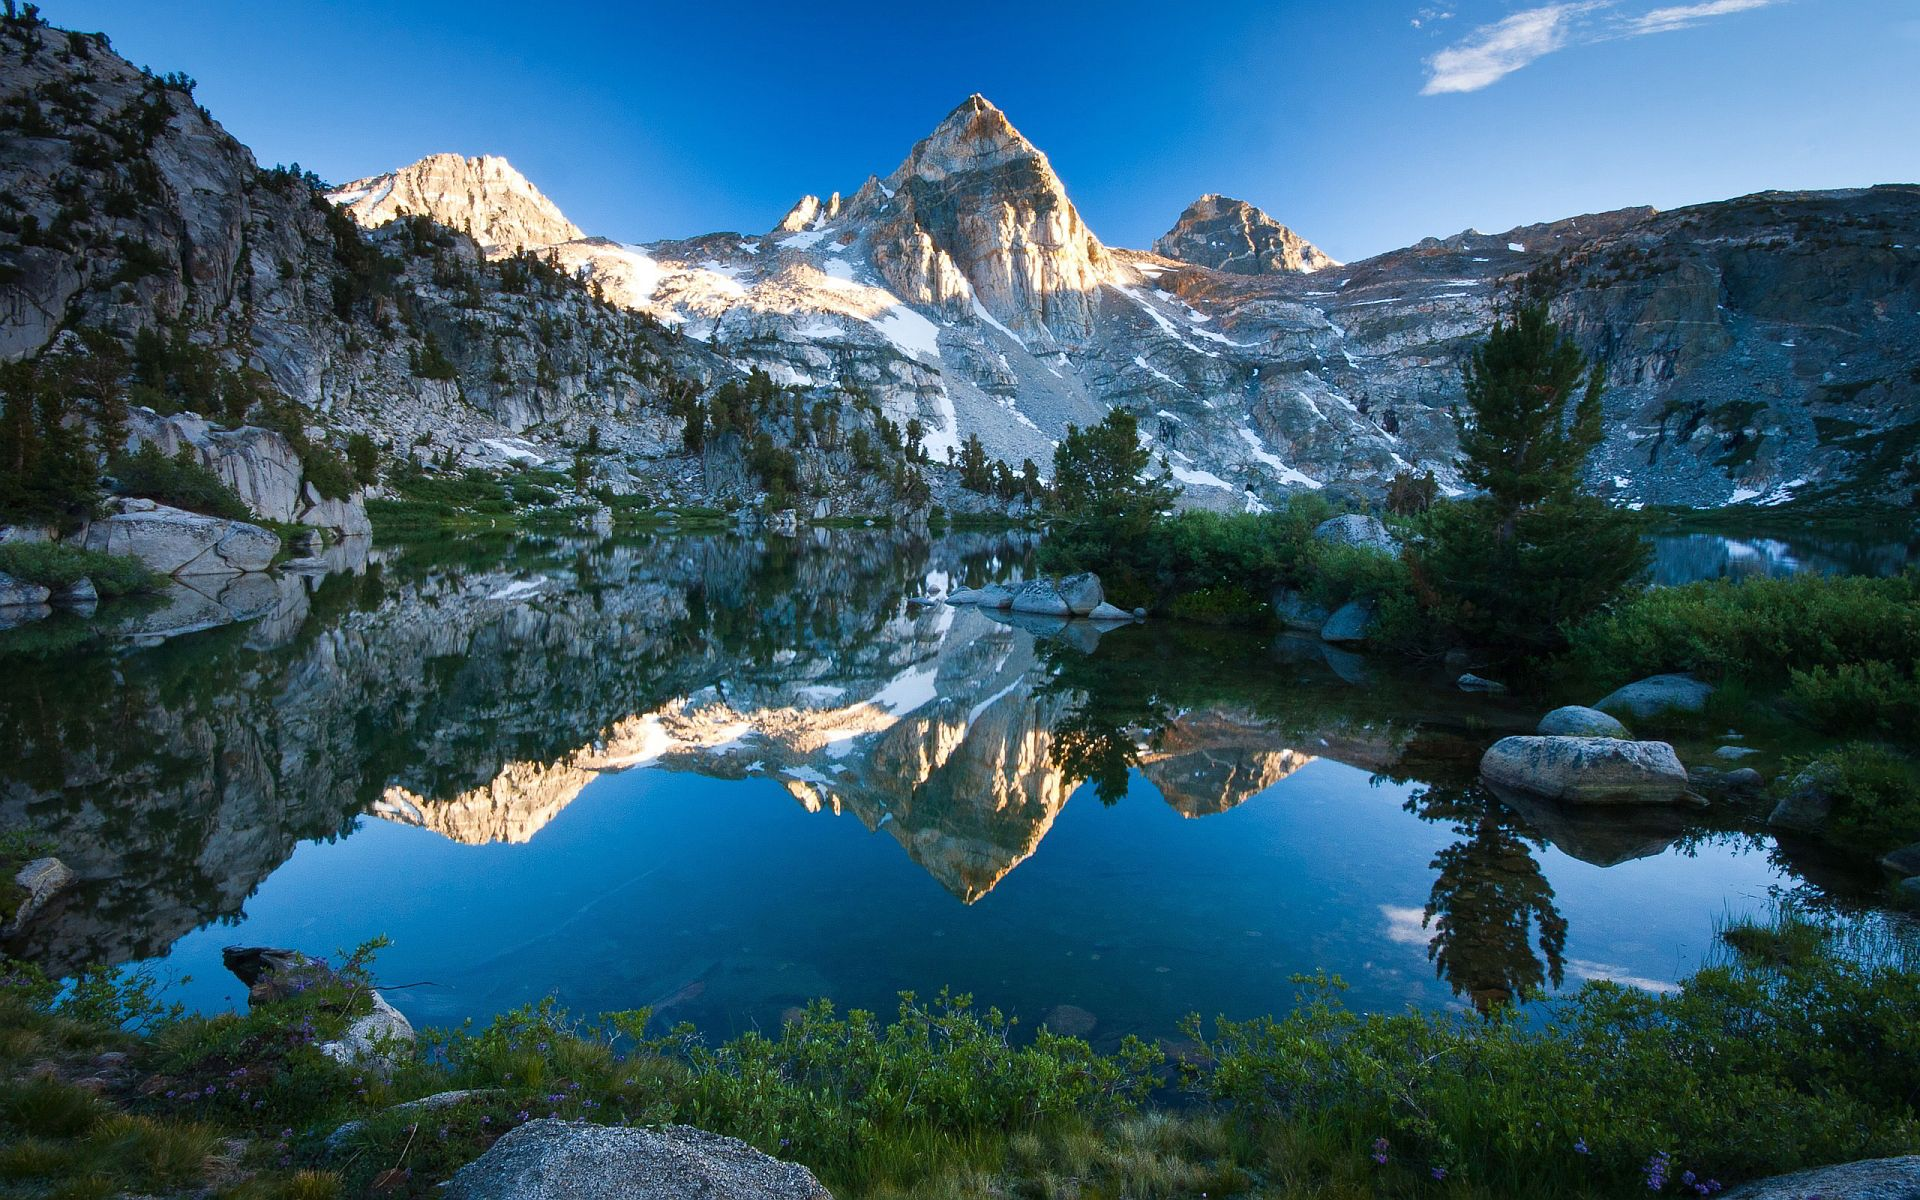 Mountain Lake Scenery HD desktop wallpaper Widescreen High